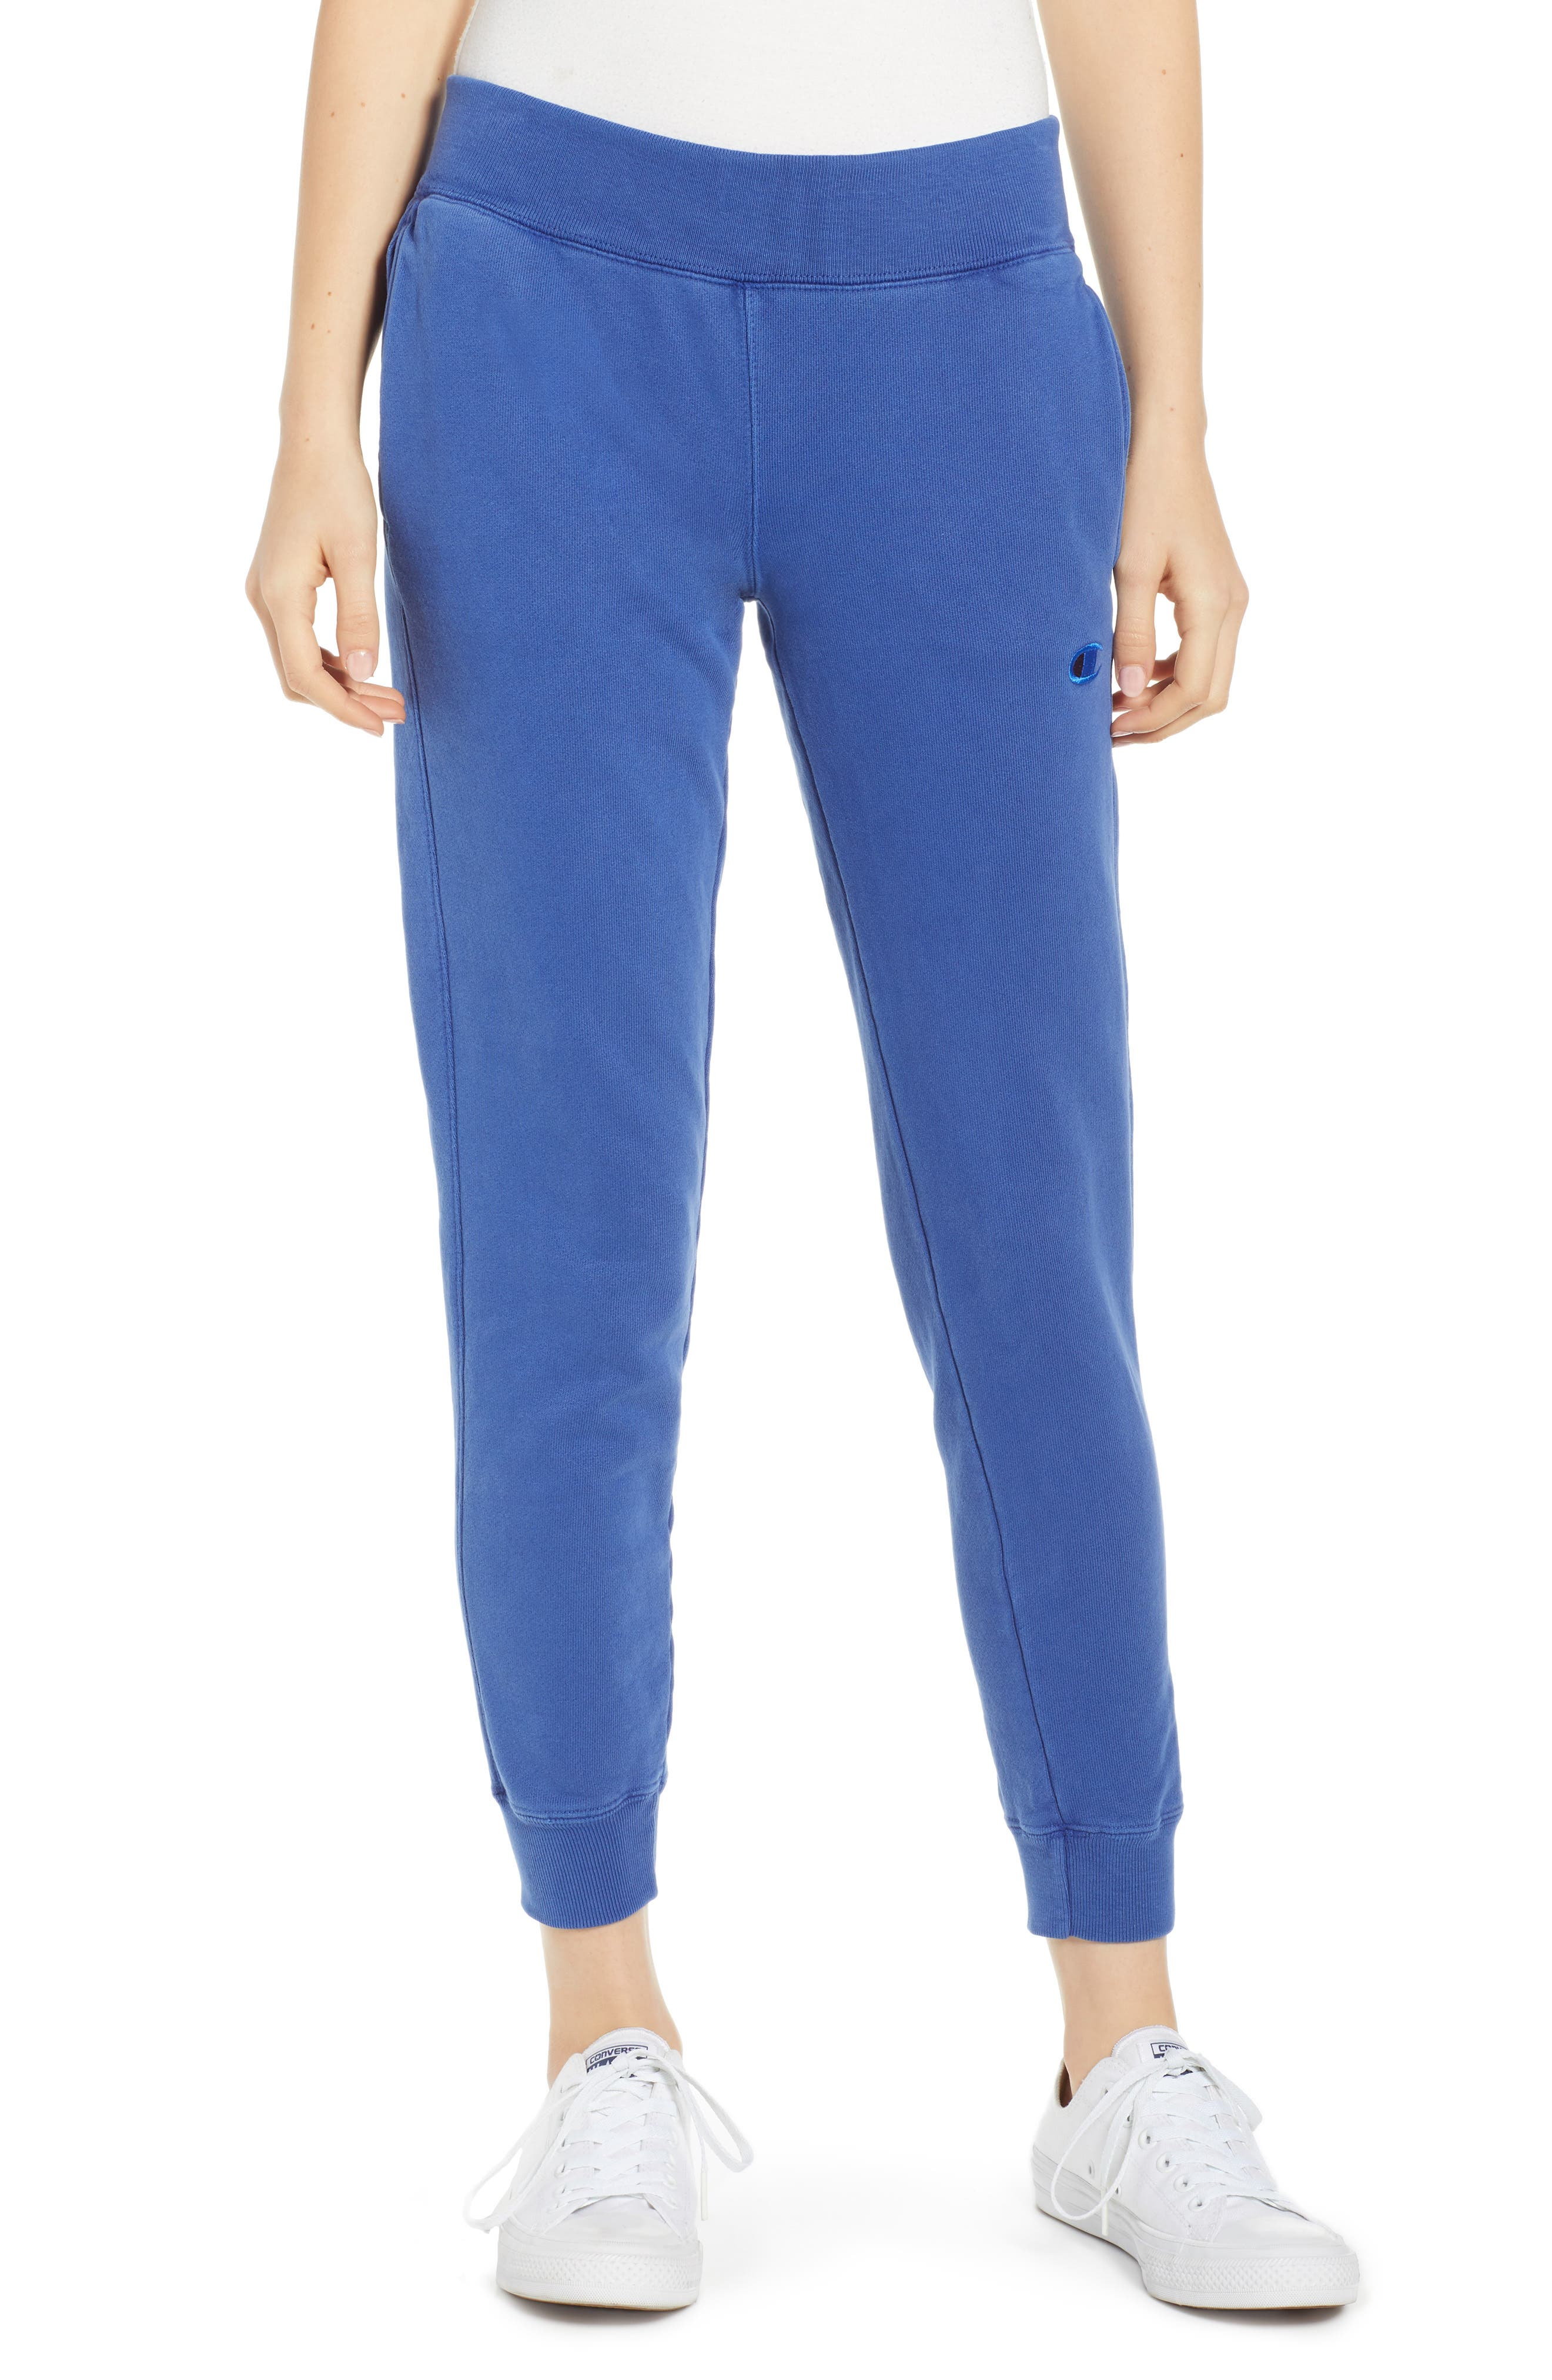 CHAMPION, Garment Dyed Jogger Pants, Main thumbnail 1, color, 400